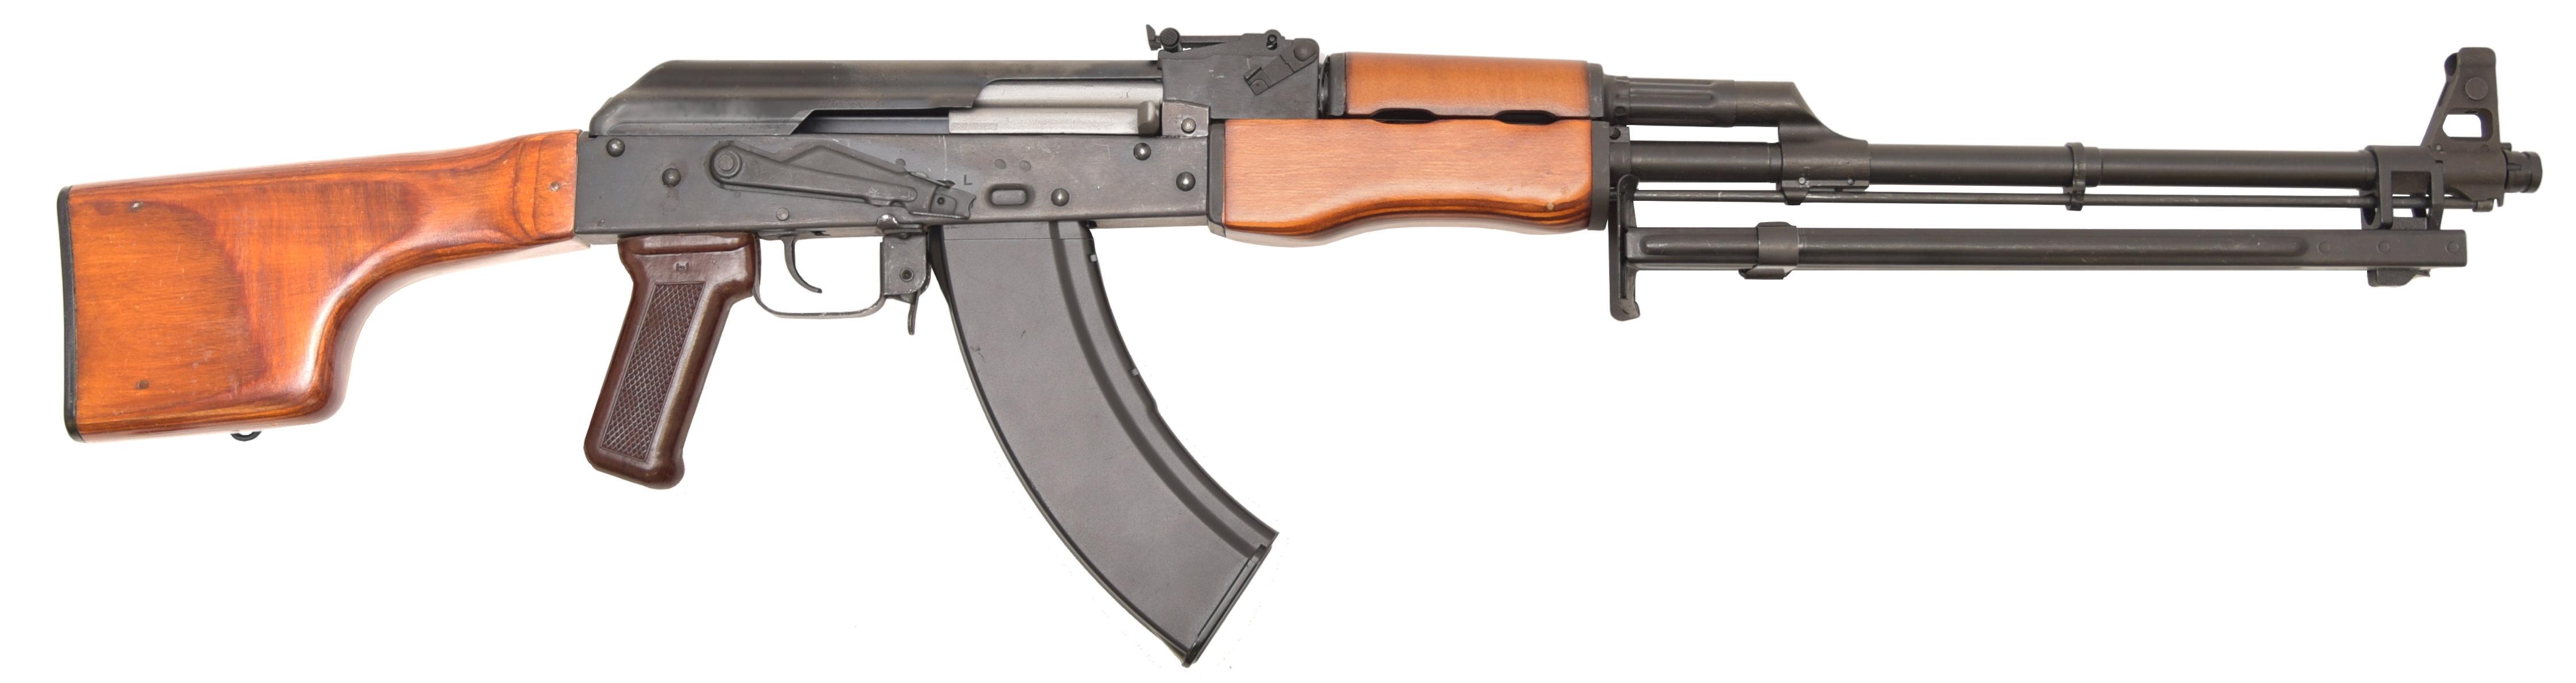 http://www.russ-guns-de.net/media/image/95/50/05/RPK_BANNER_001.jpg